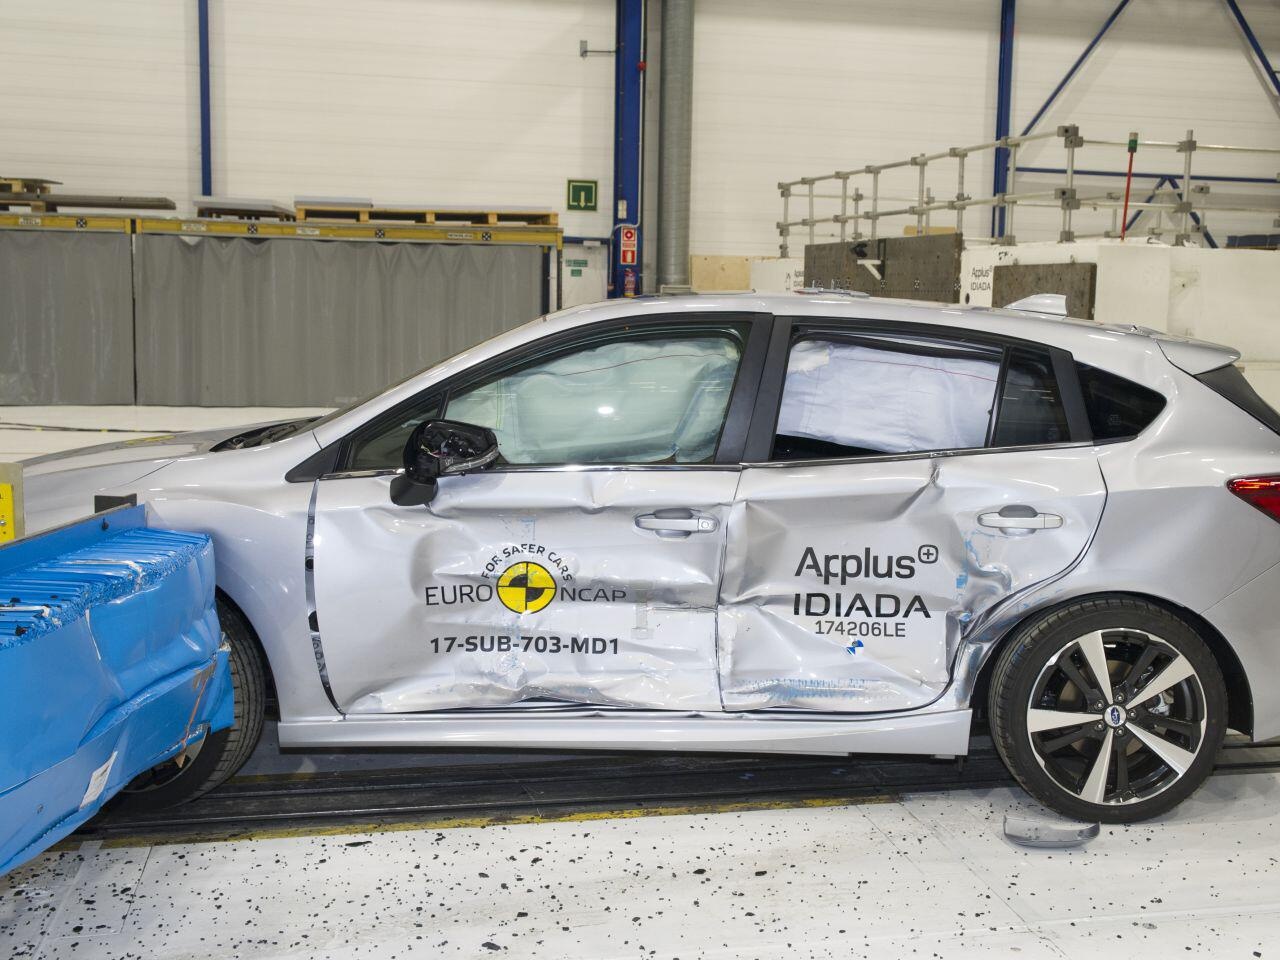 Bild zu Sieger Kompaktklasse: Subaru Impreza